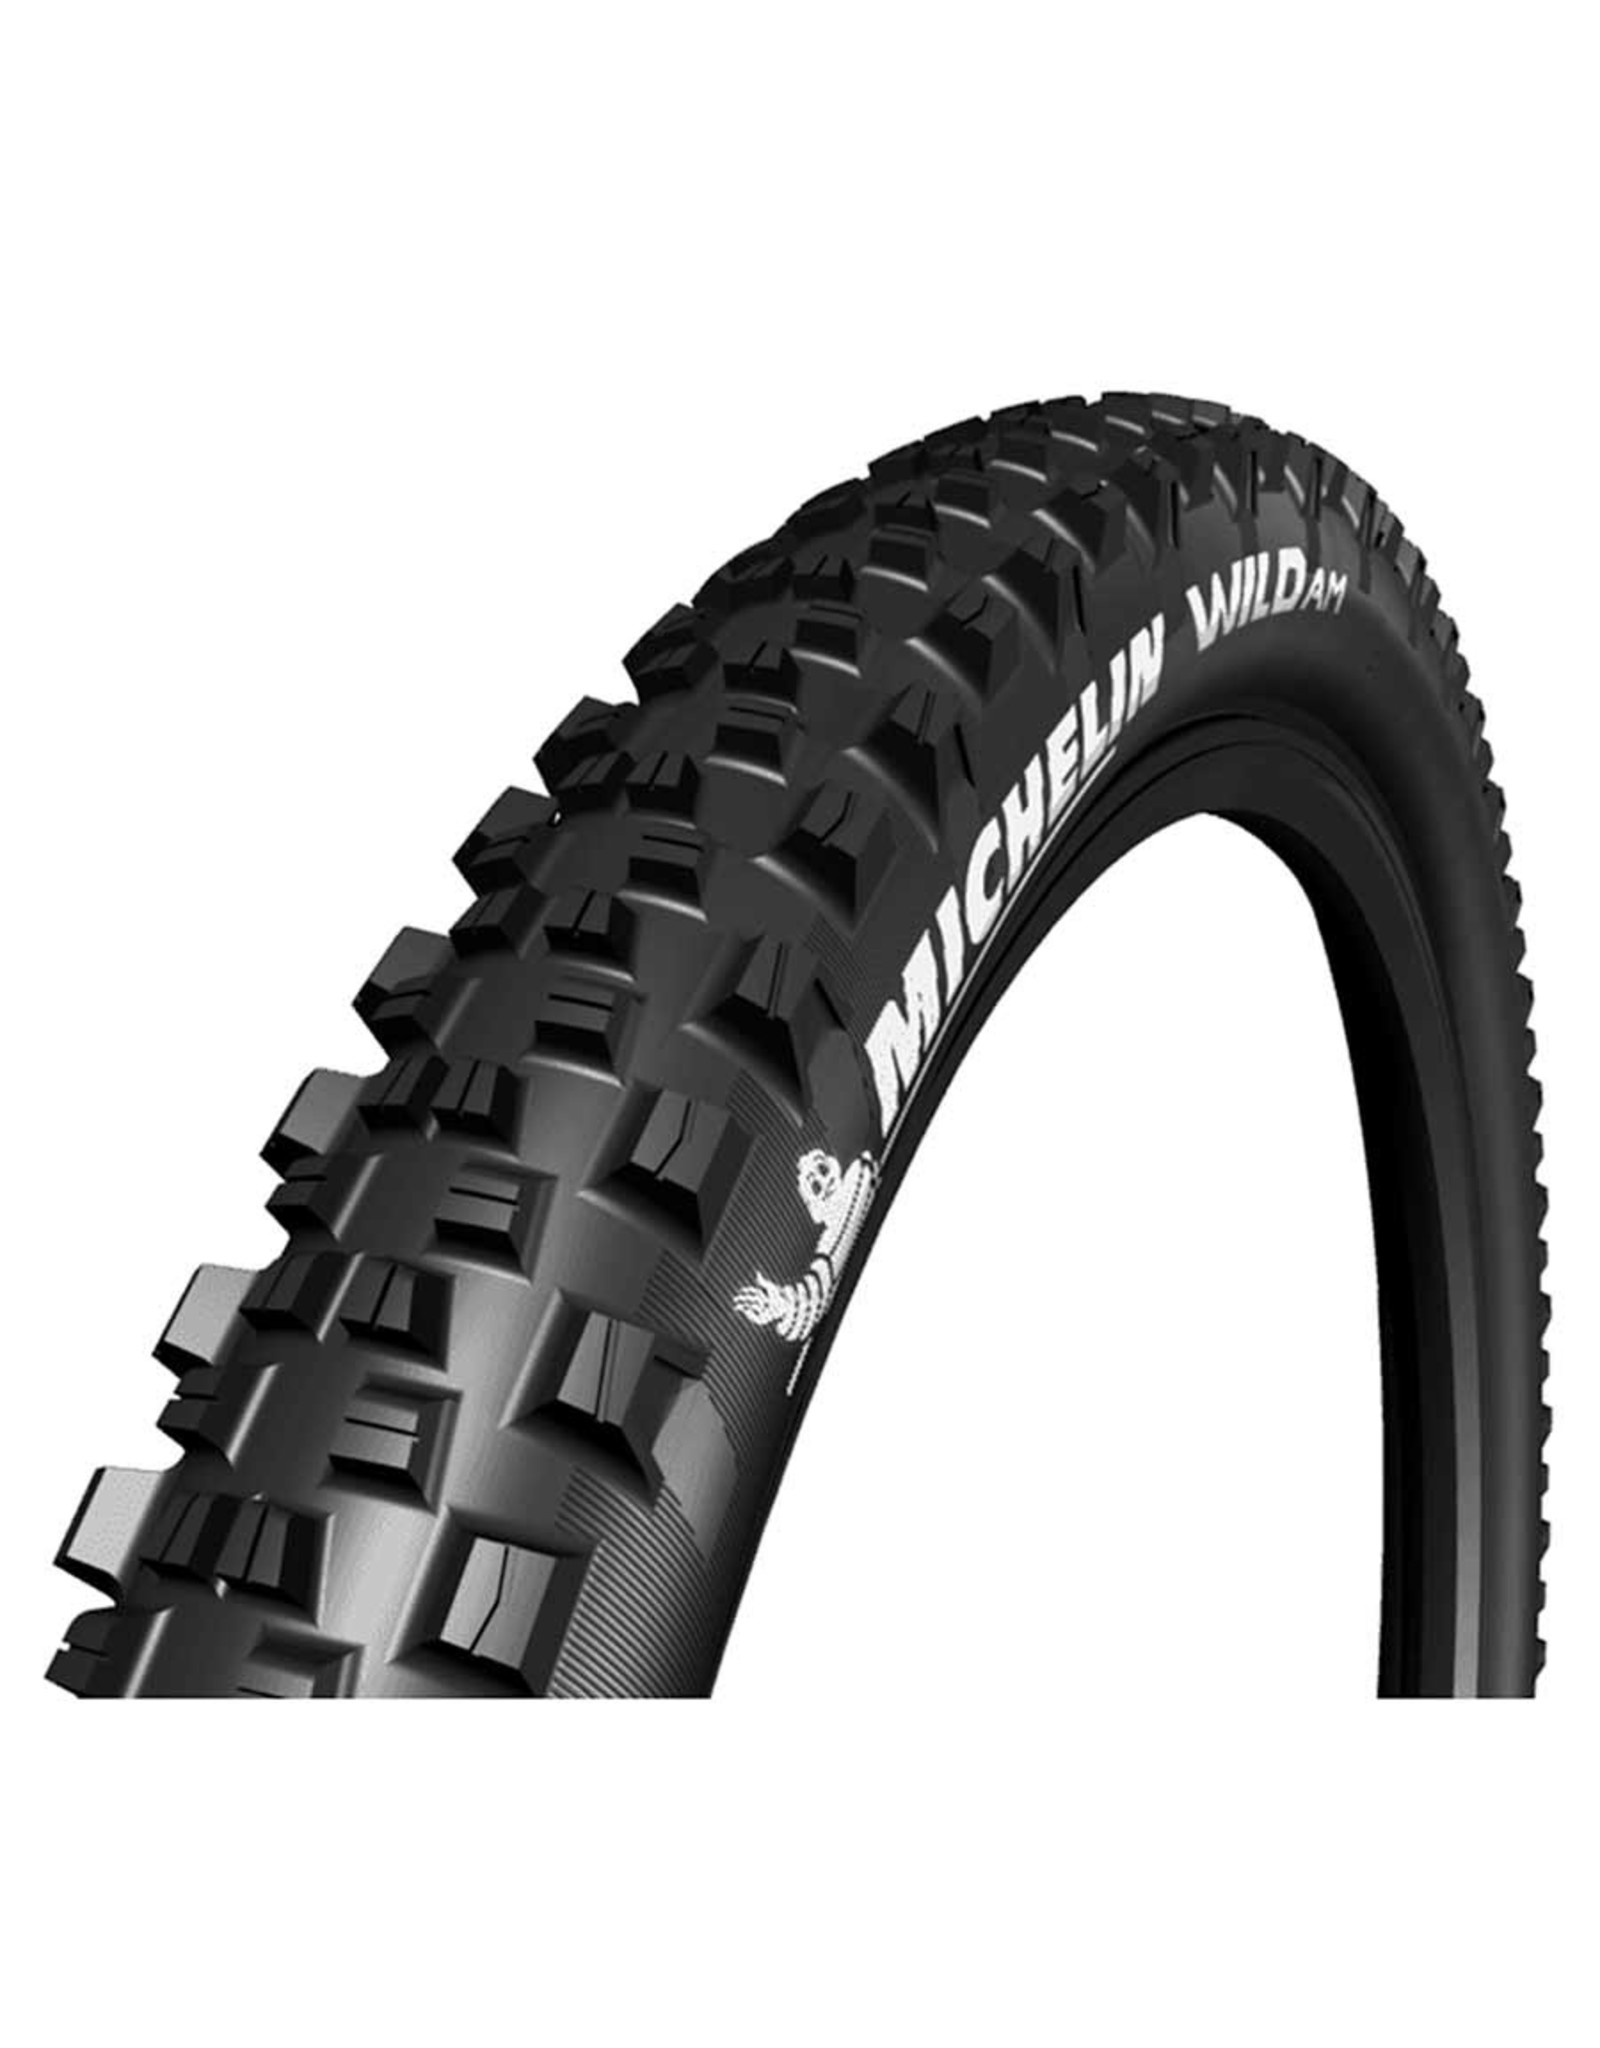 Michelin, Wild AM Comp, Tire, 27.5''x2.60, Folding, Tubeless Ready, GUM-X, 60TPI, Black